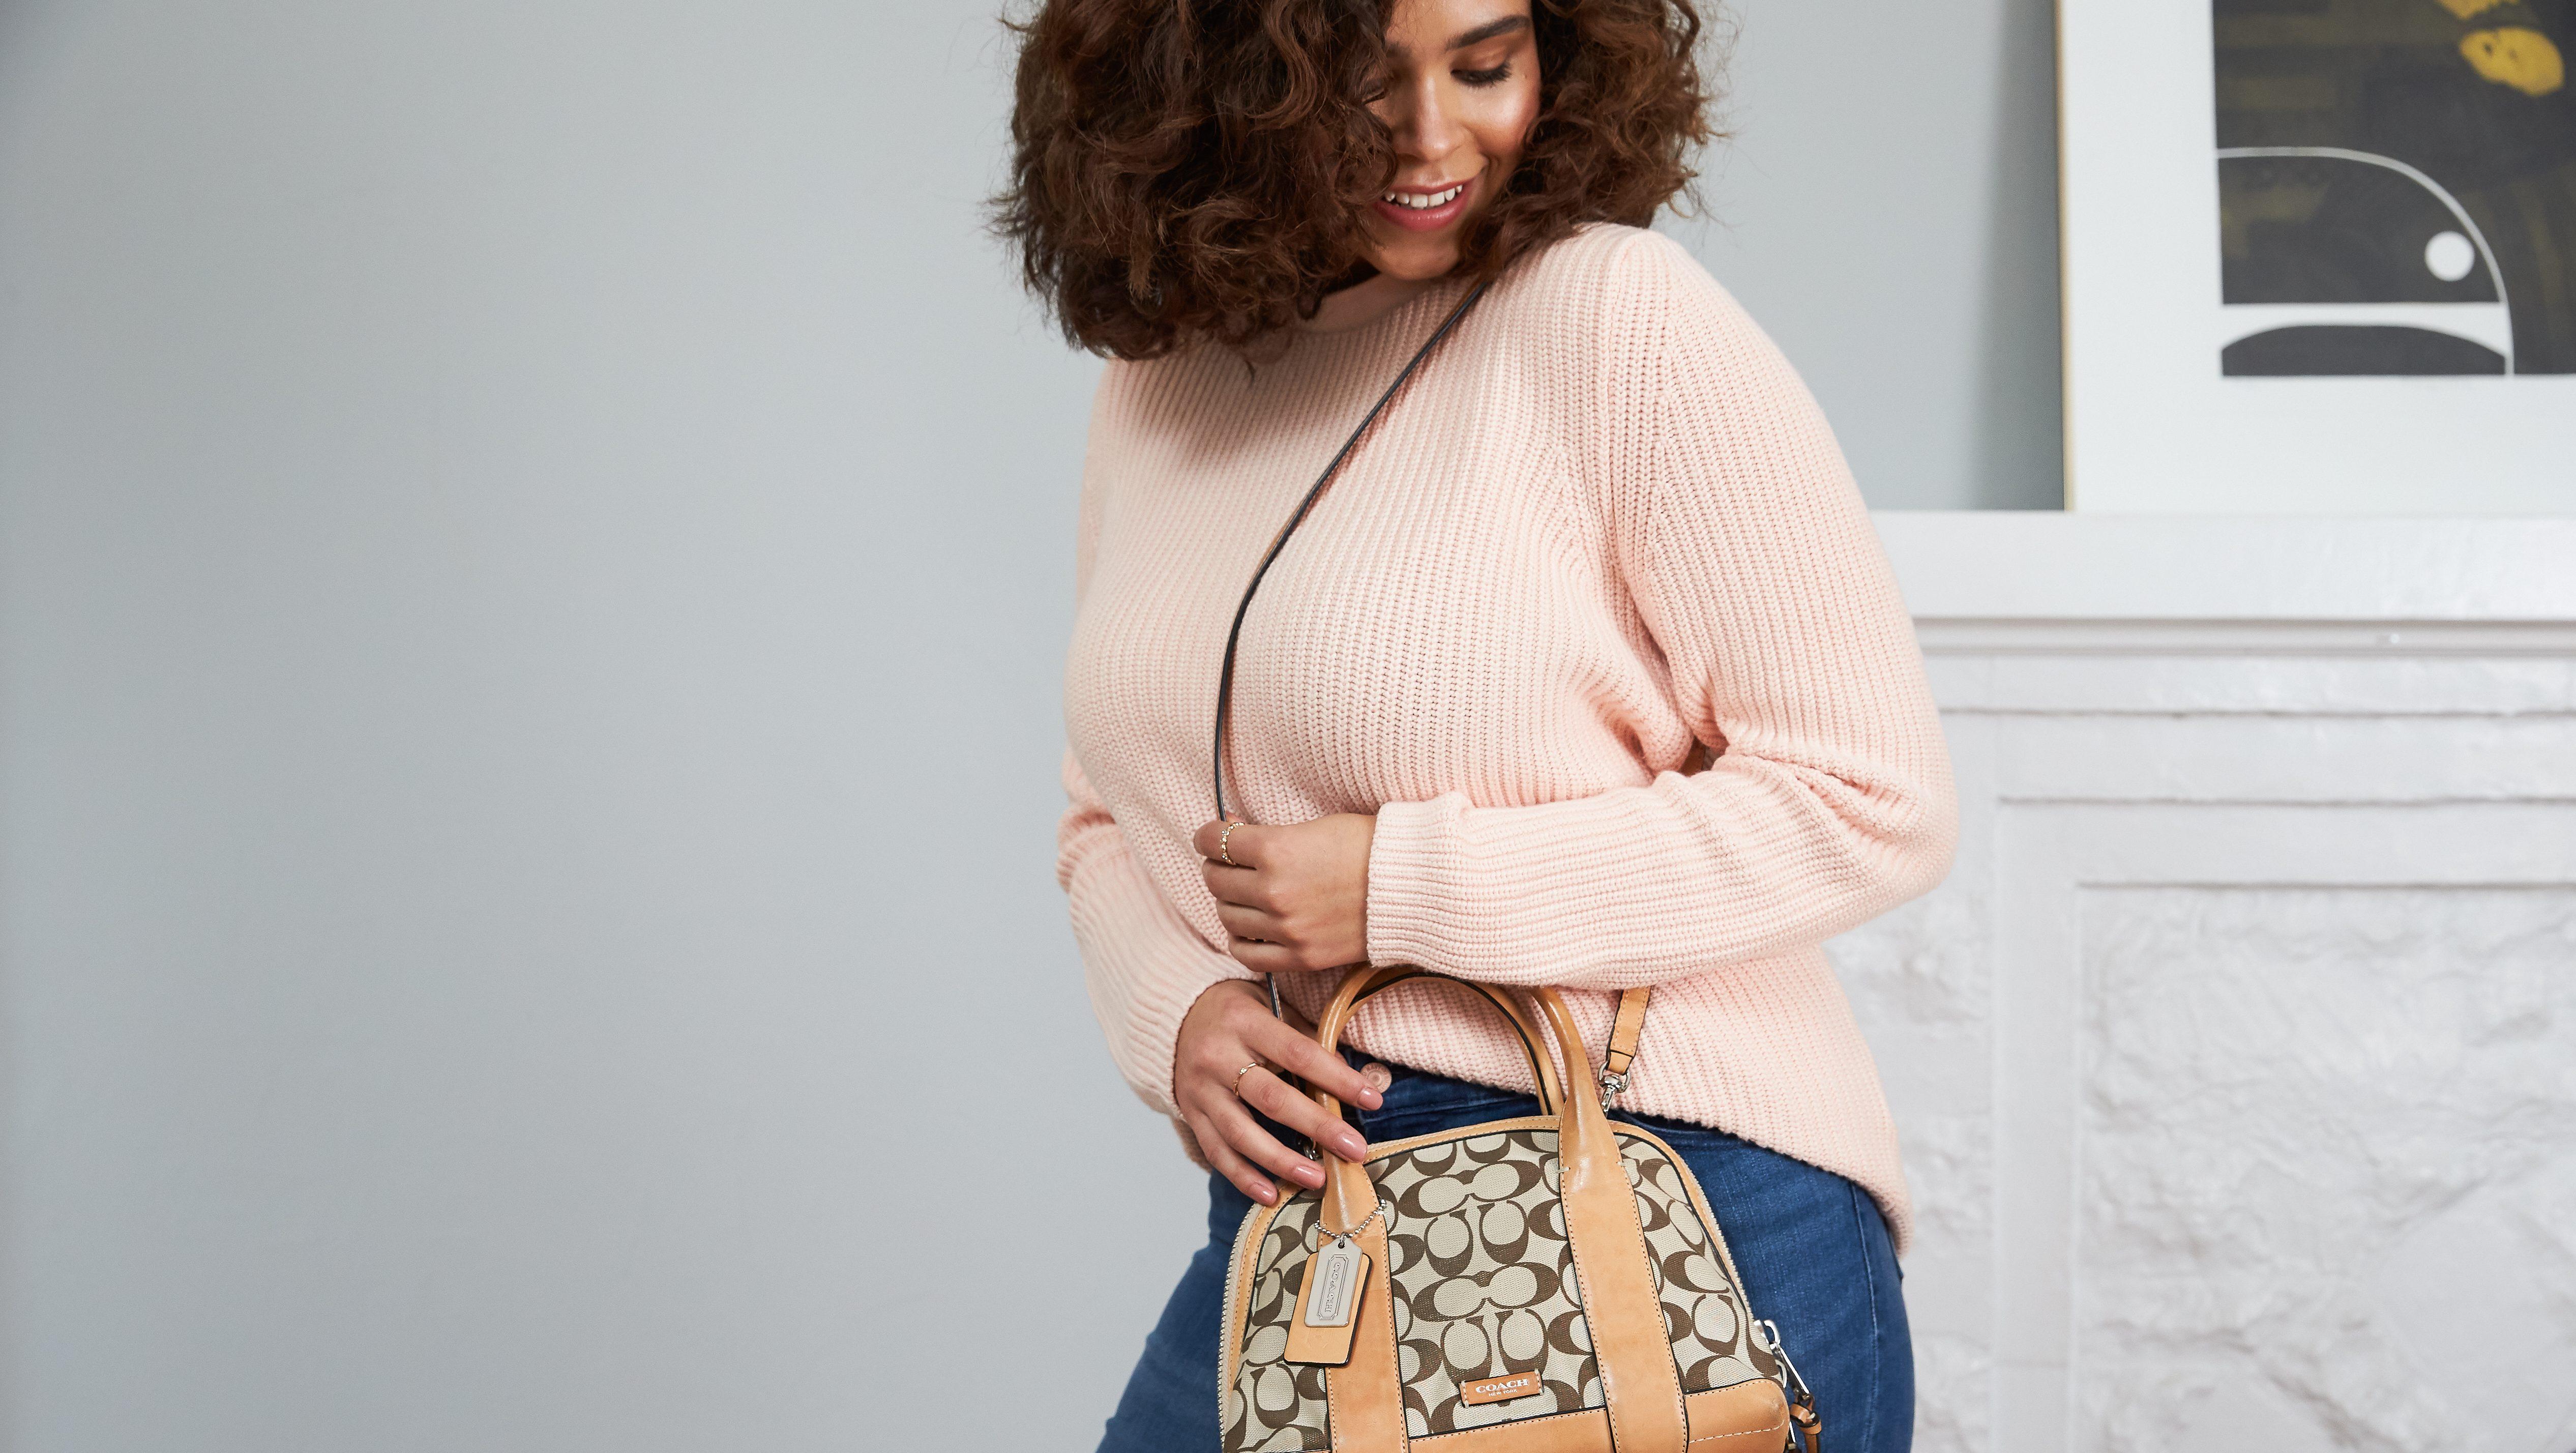 A woman wears a Coach bag